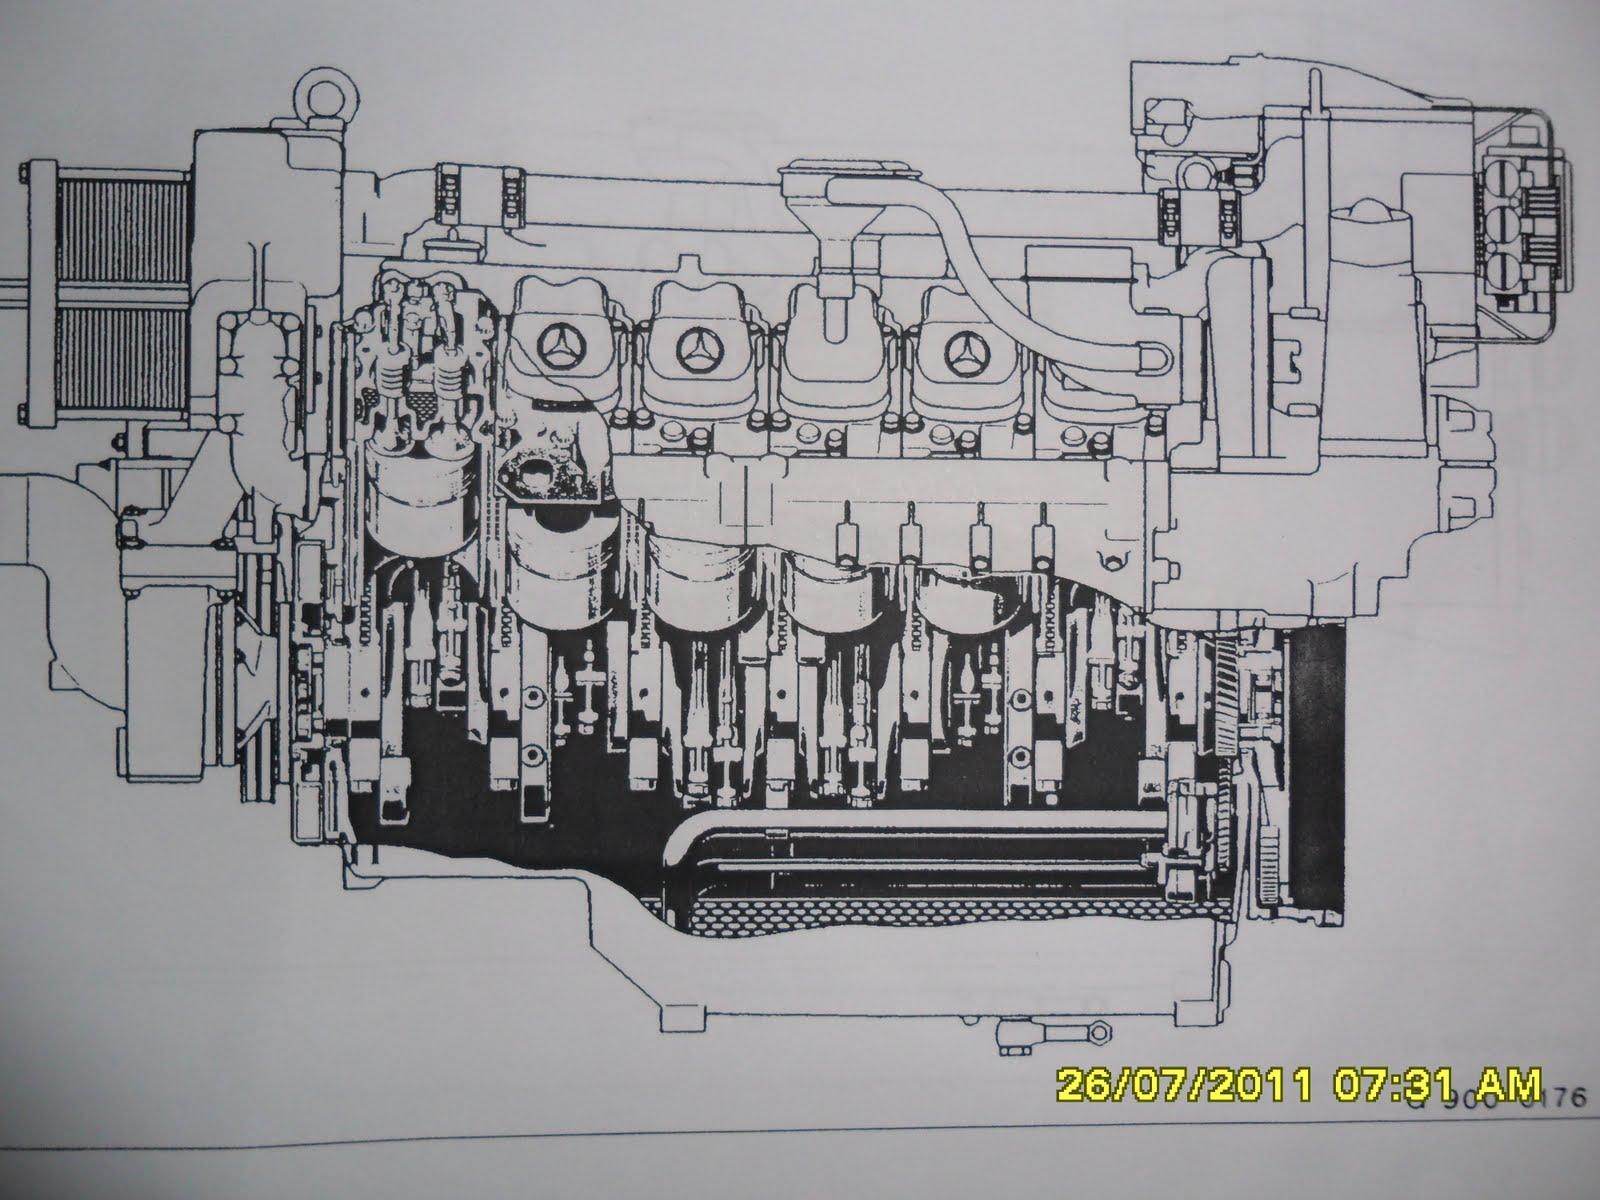 Mtu 12v manual